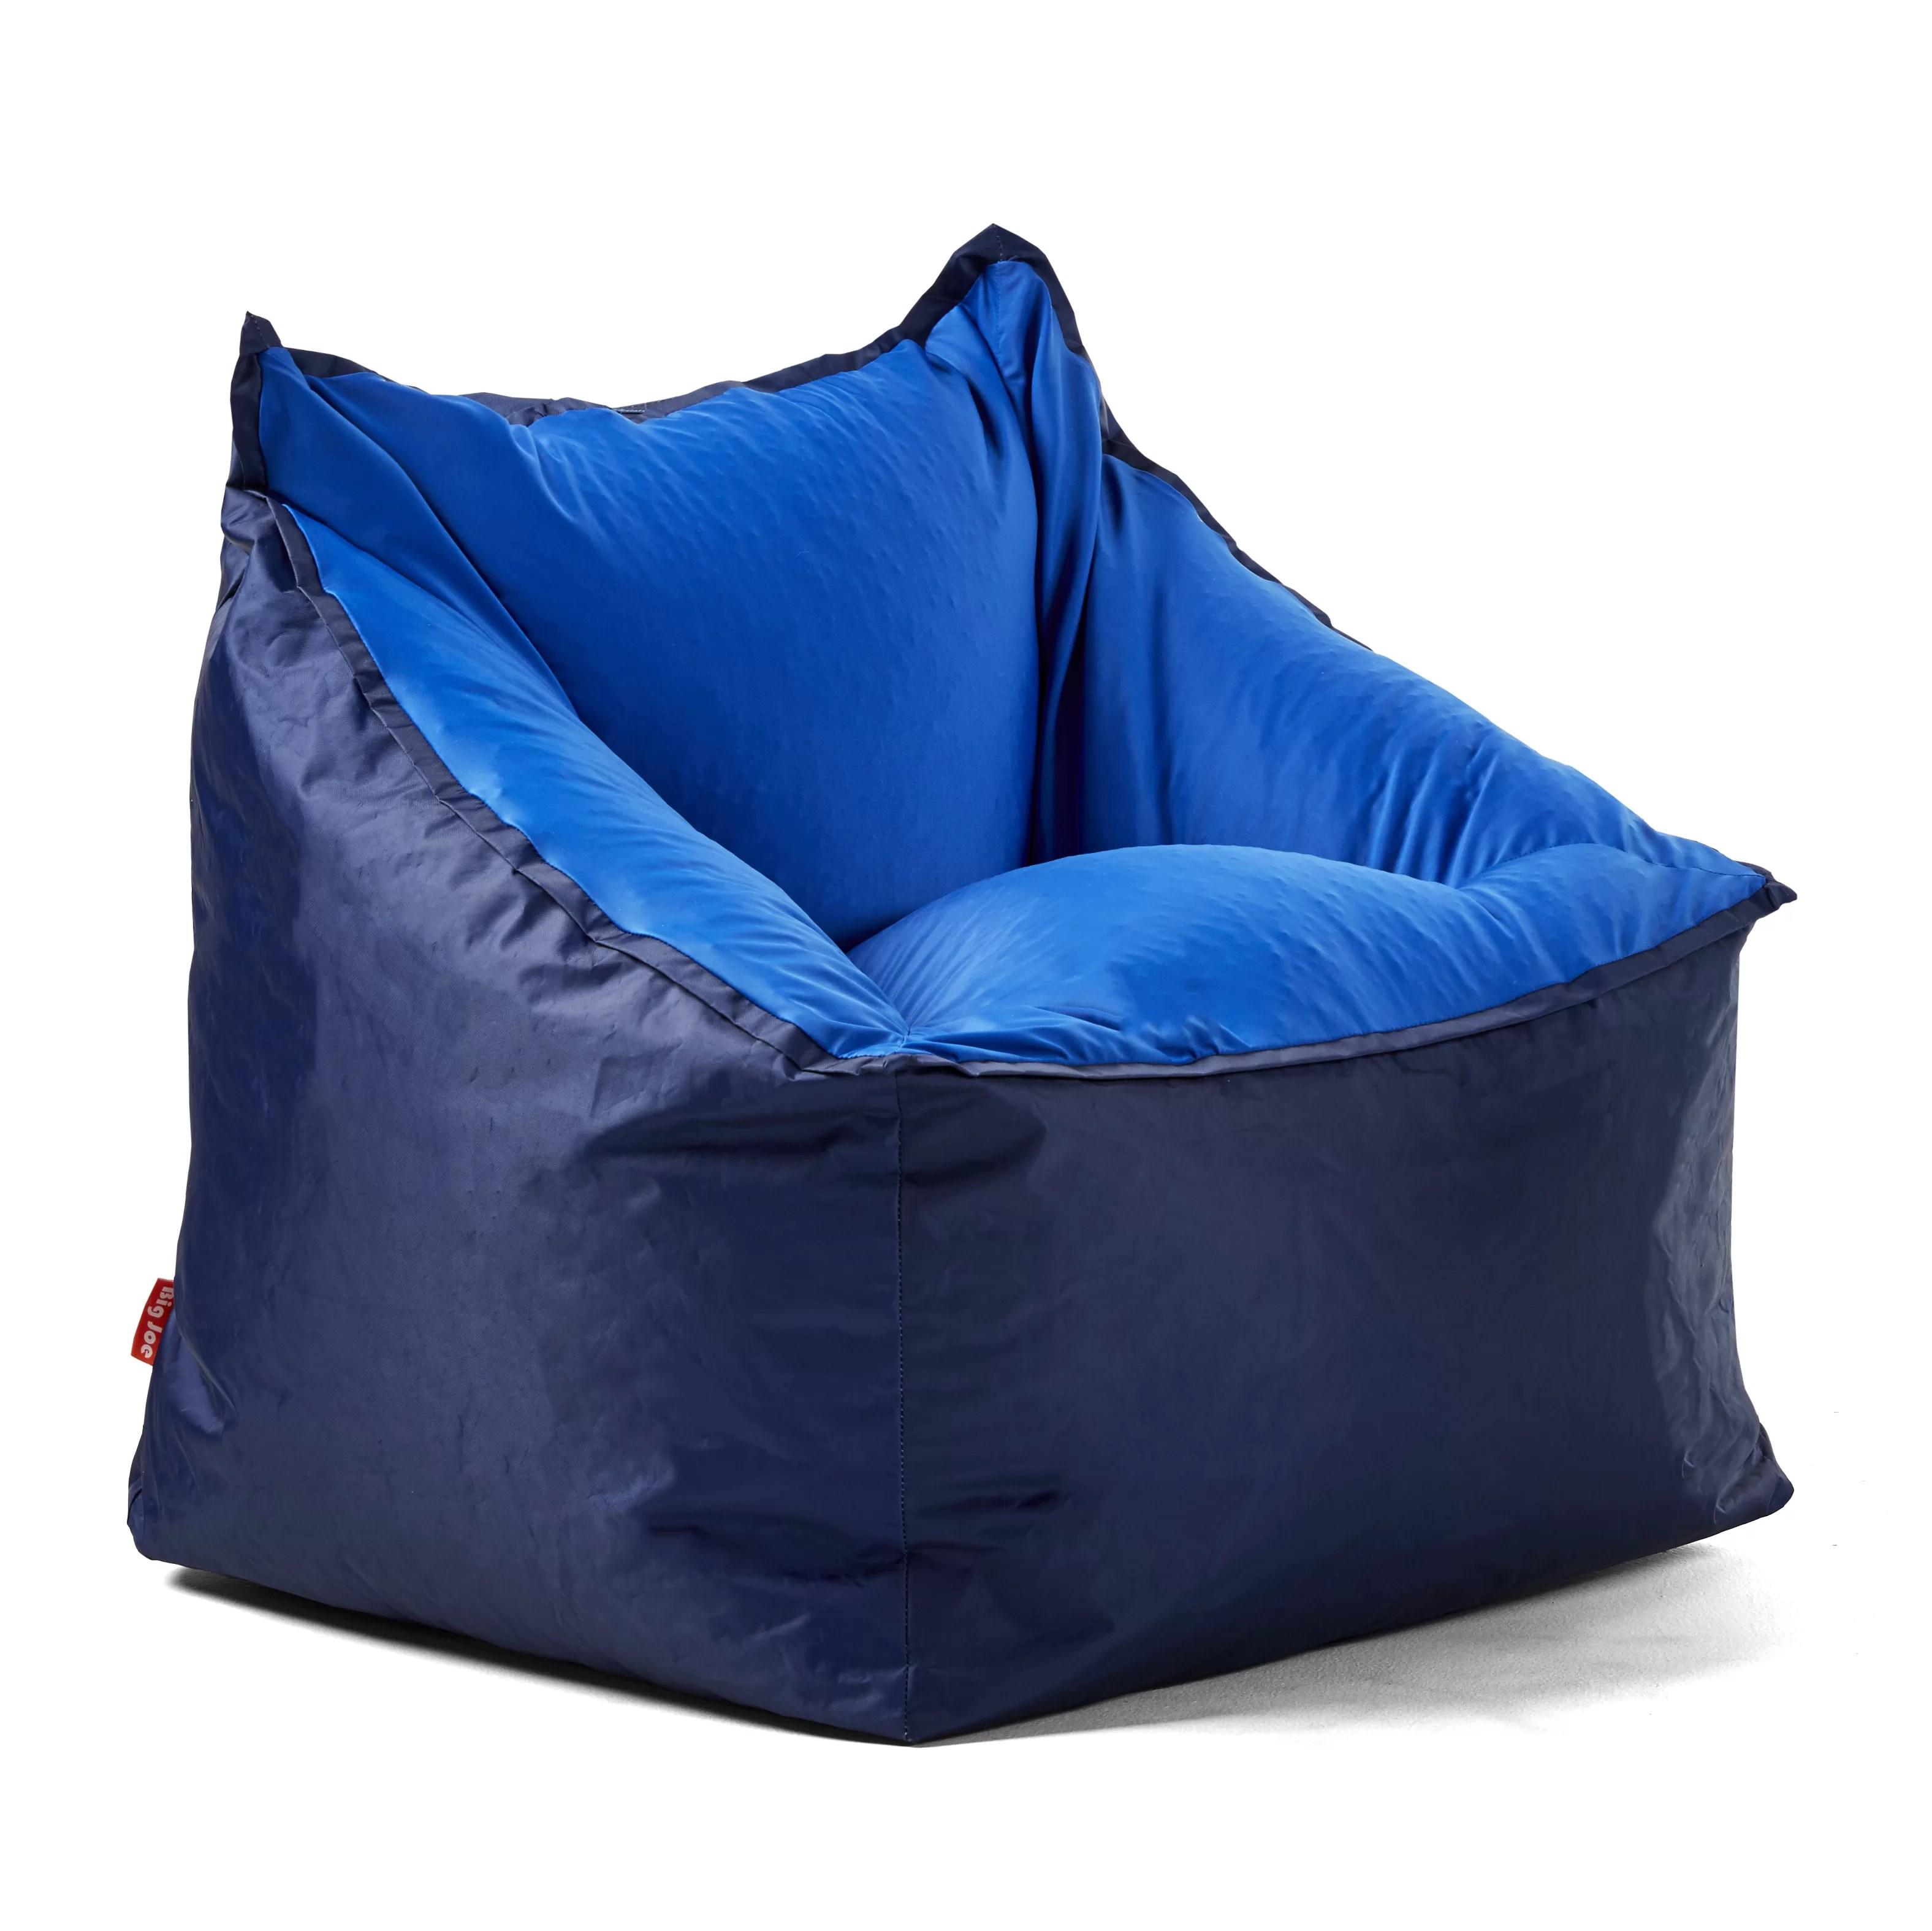 big joe bean bag chair tables and chairs for restaurants comfort research slalom reviews wayfair